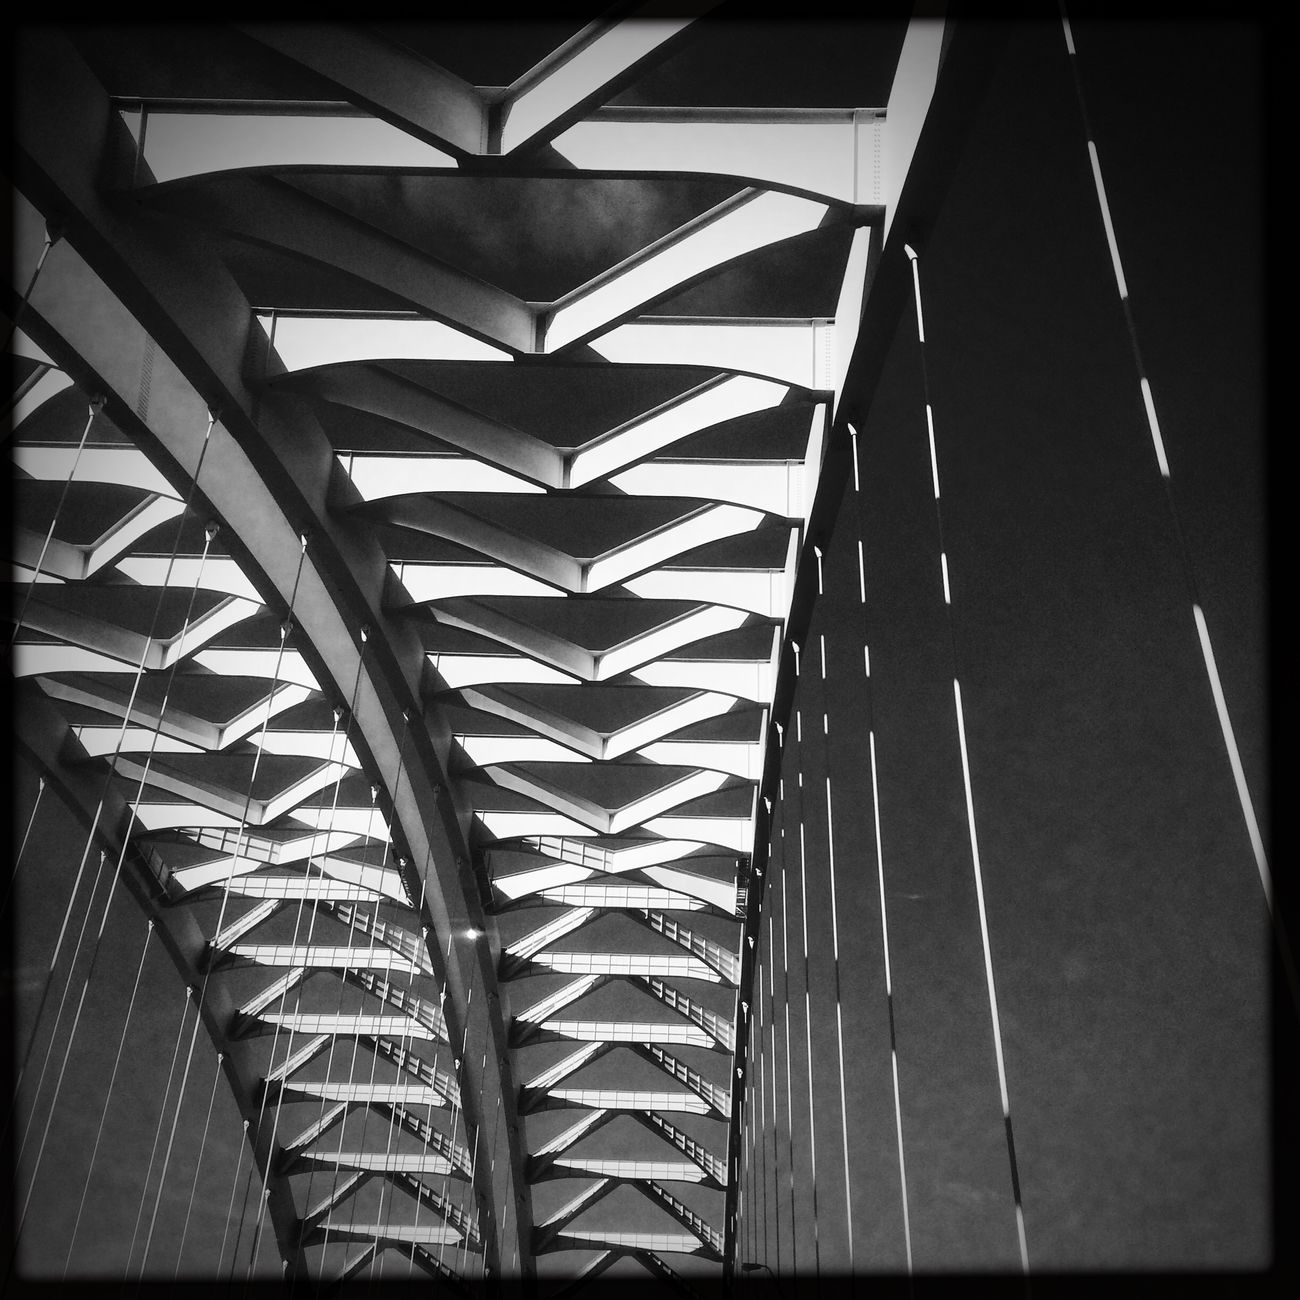 Bridge Abstract Blackandwhite Monochrome Hipstamatic IPhoneography